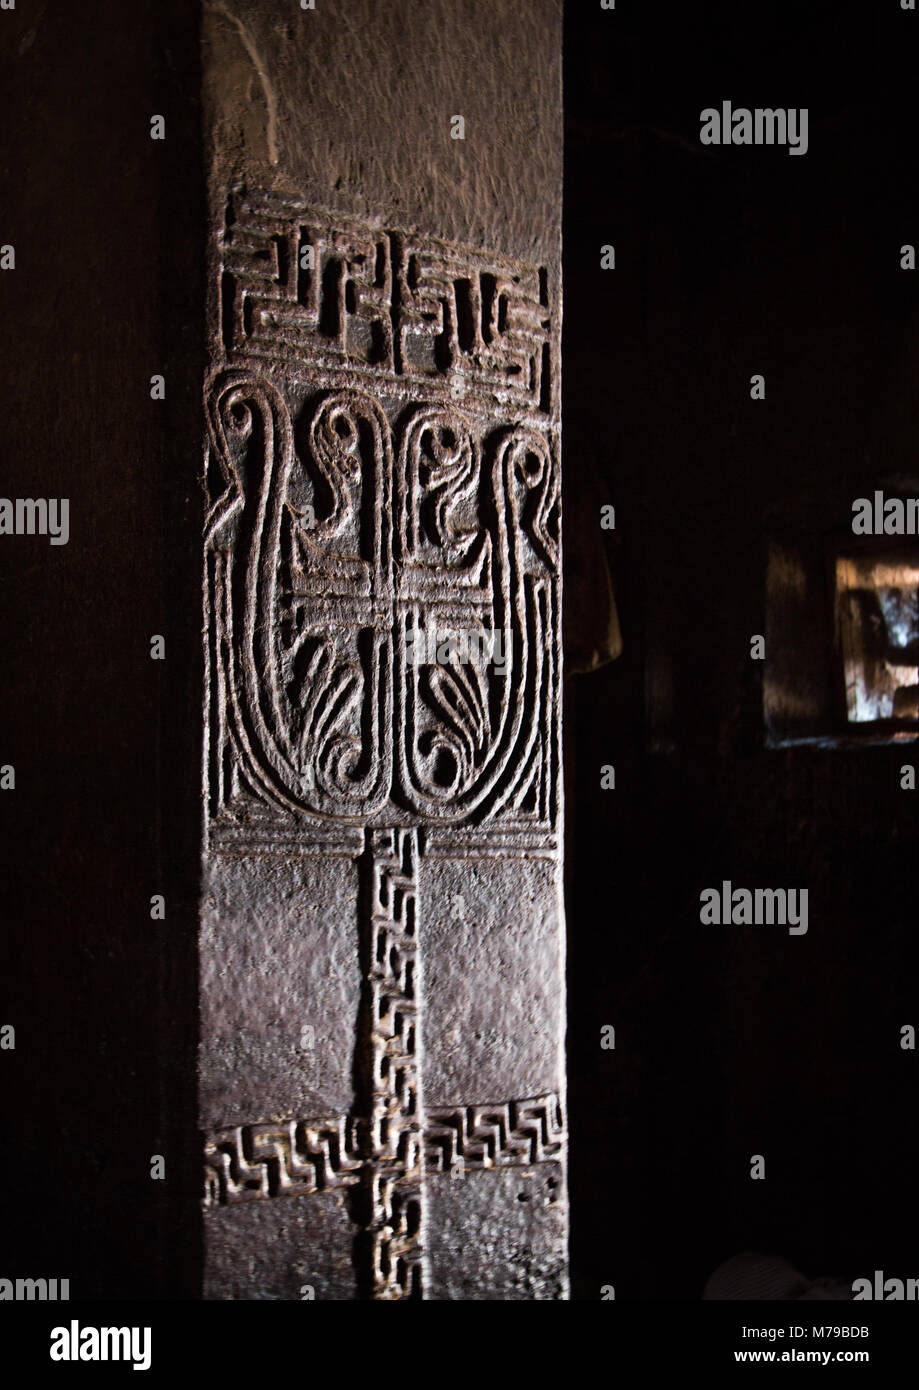 Carved column inside bet medhane alem, Amhara region, Lalibela, Ethiopia - Stock Image